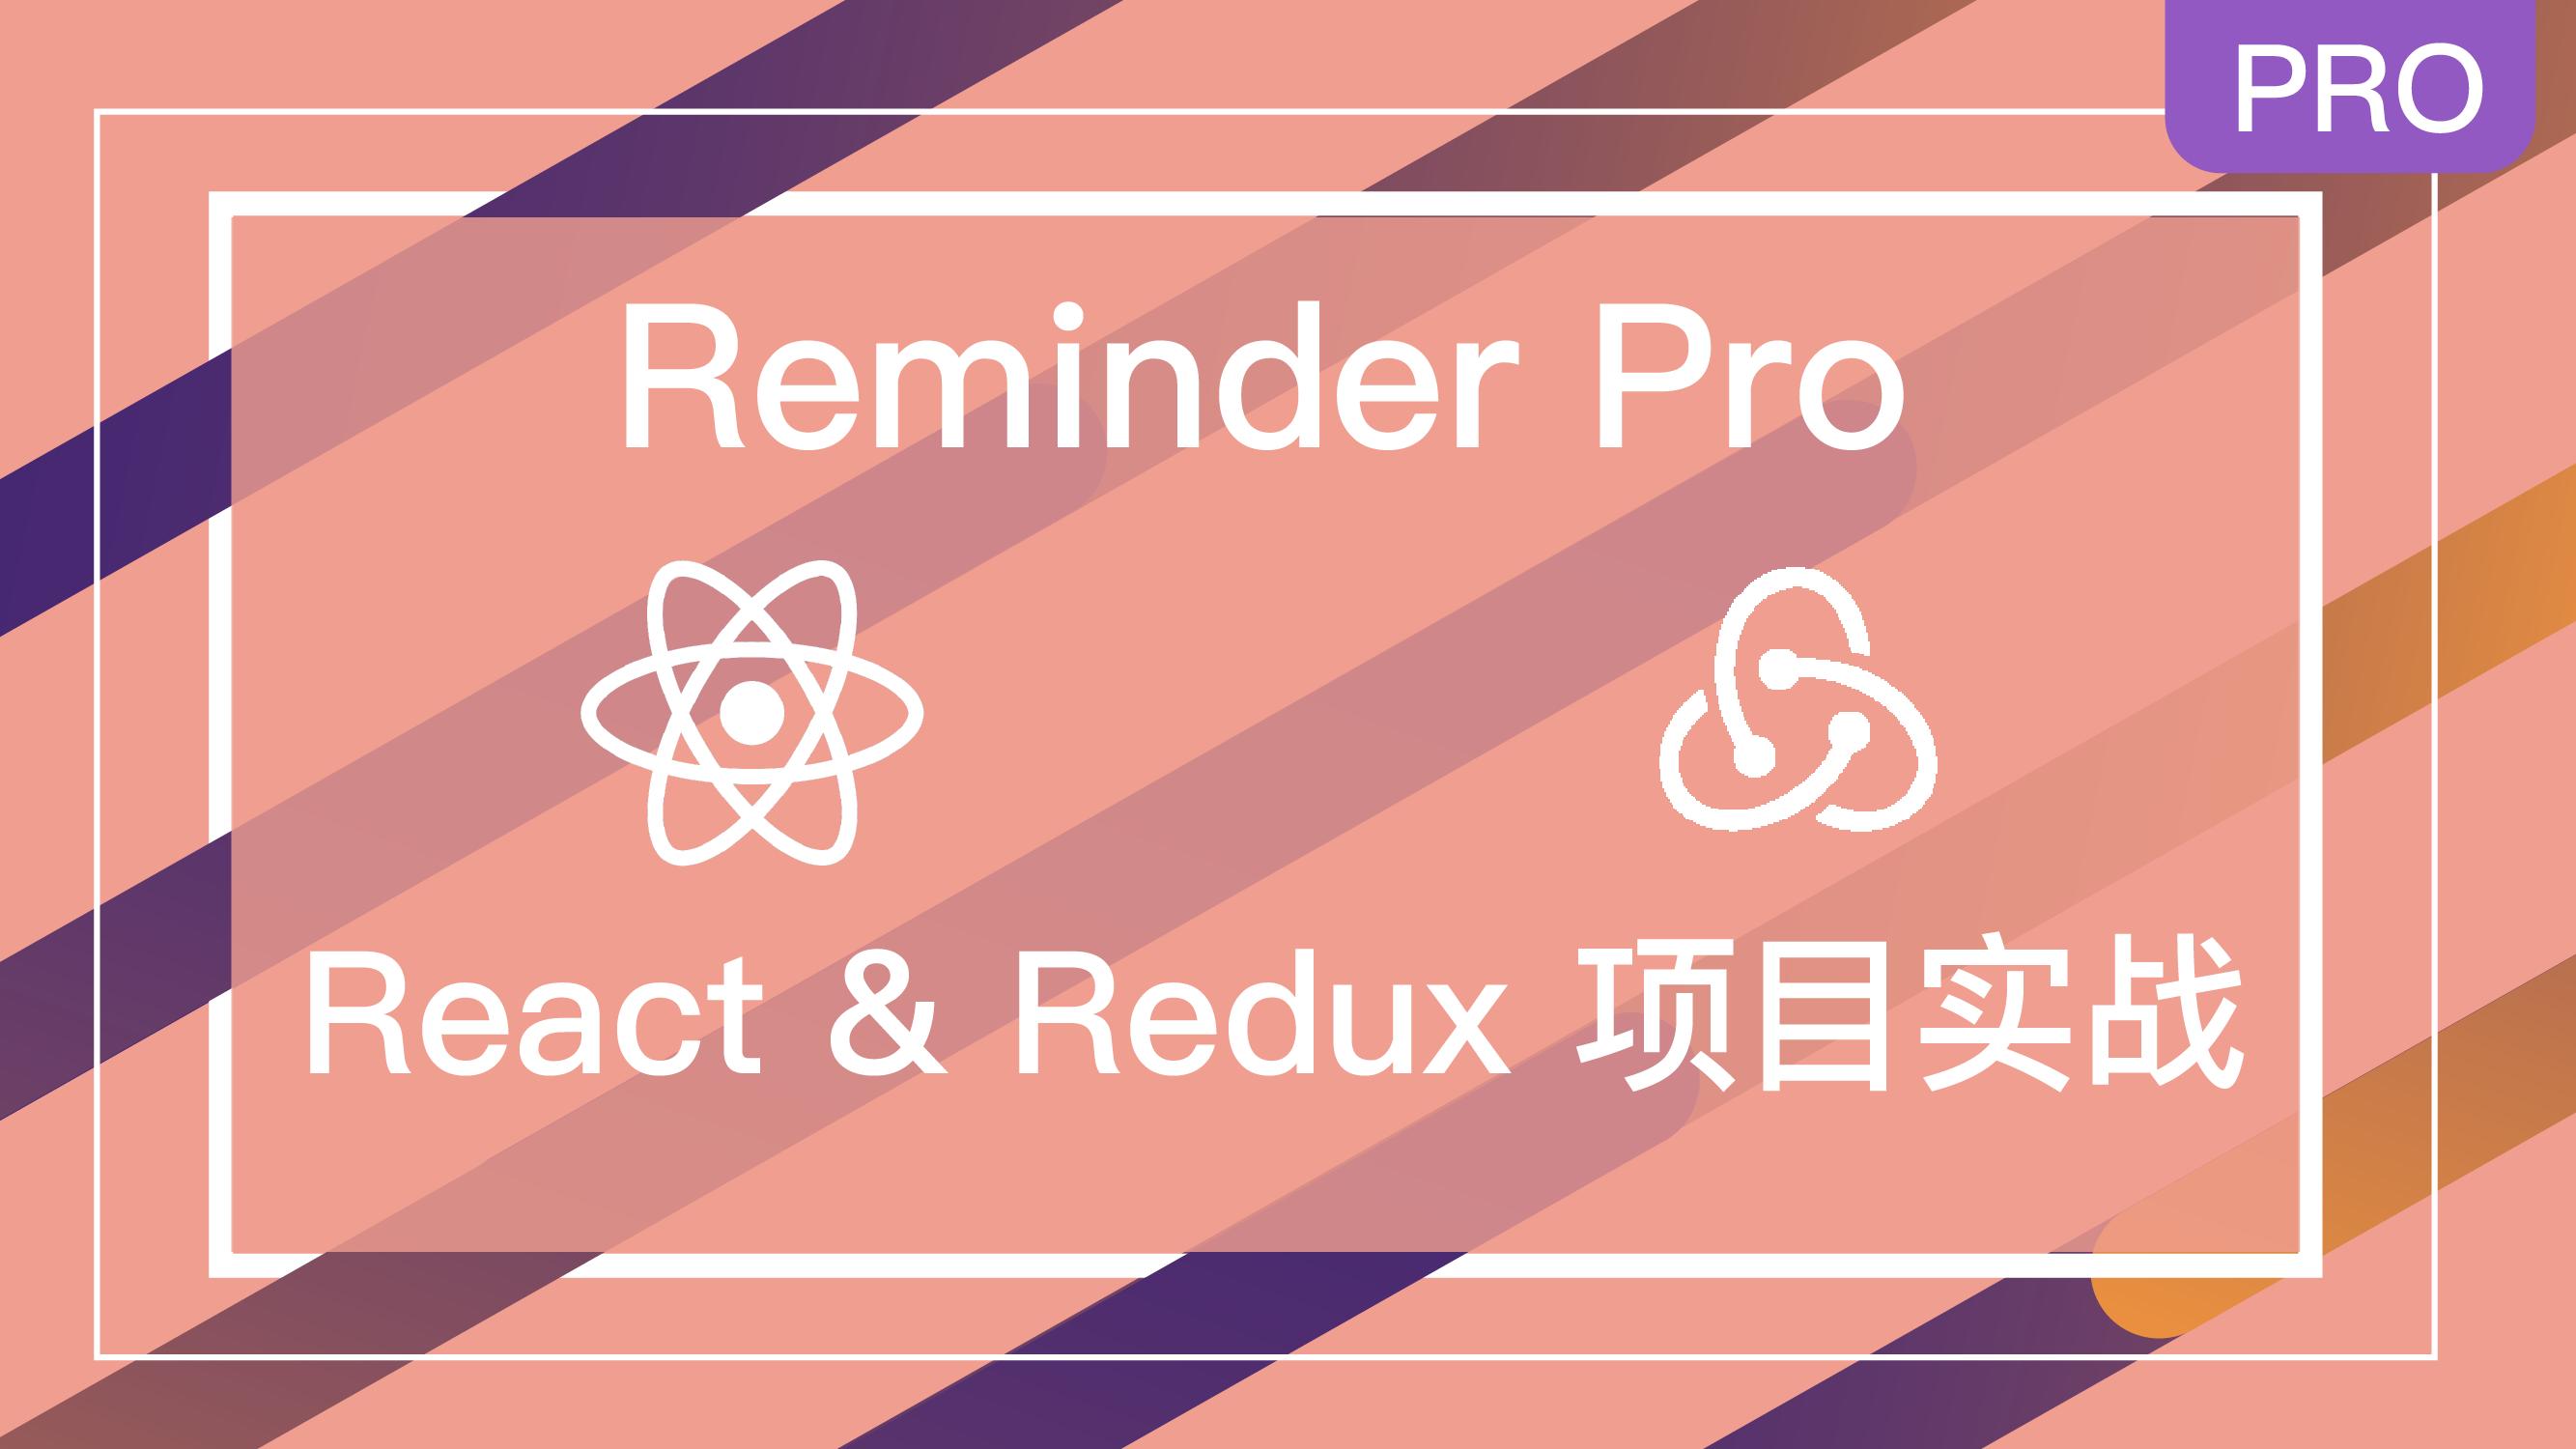 React & Redux 实战 Reminder Pro 项目